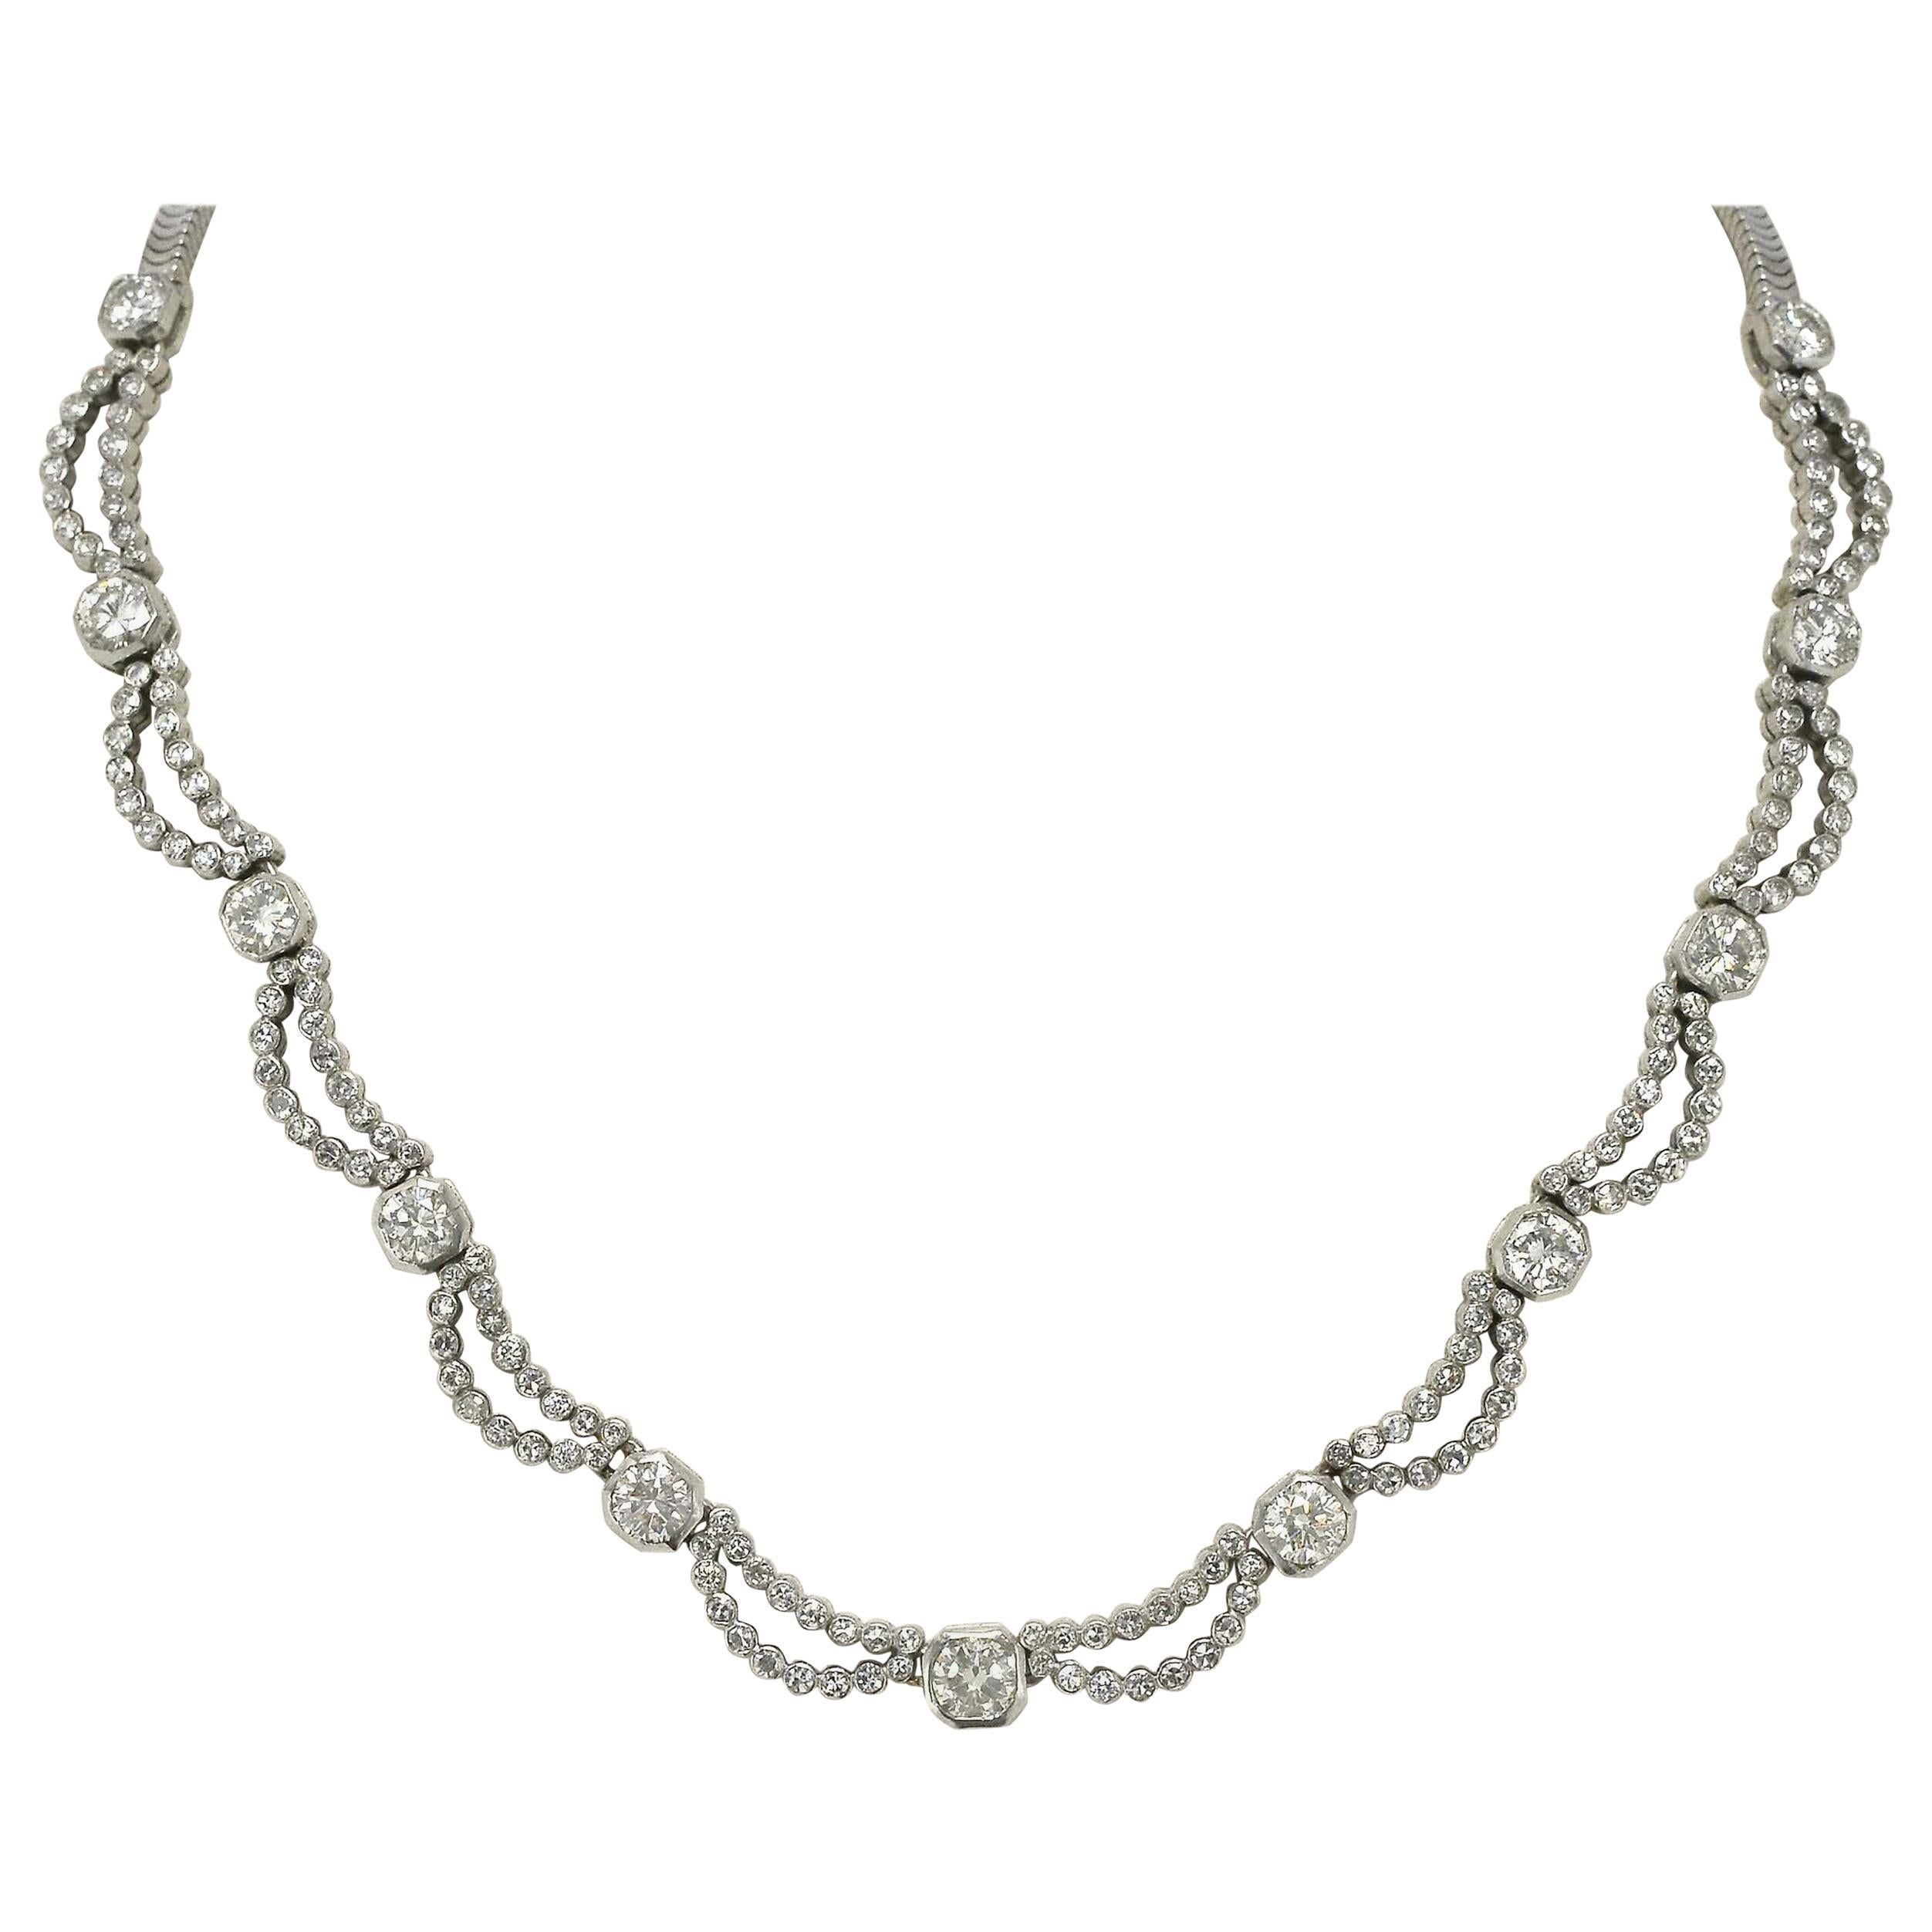 5 Carat Diamond Art Deco Waterfall Necklace Scalloped Bib Snake Chain Platinum